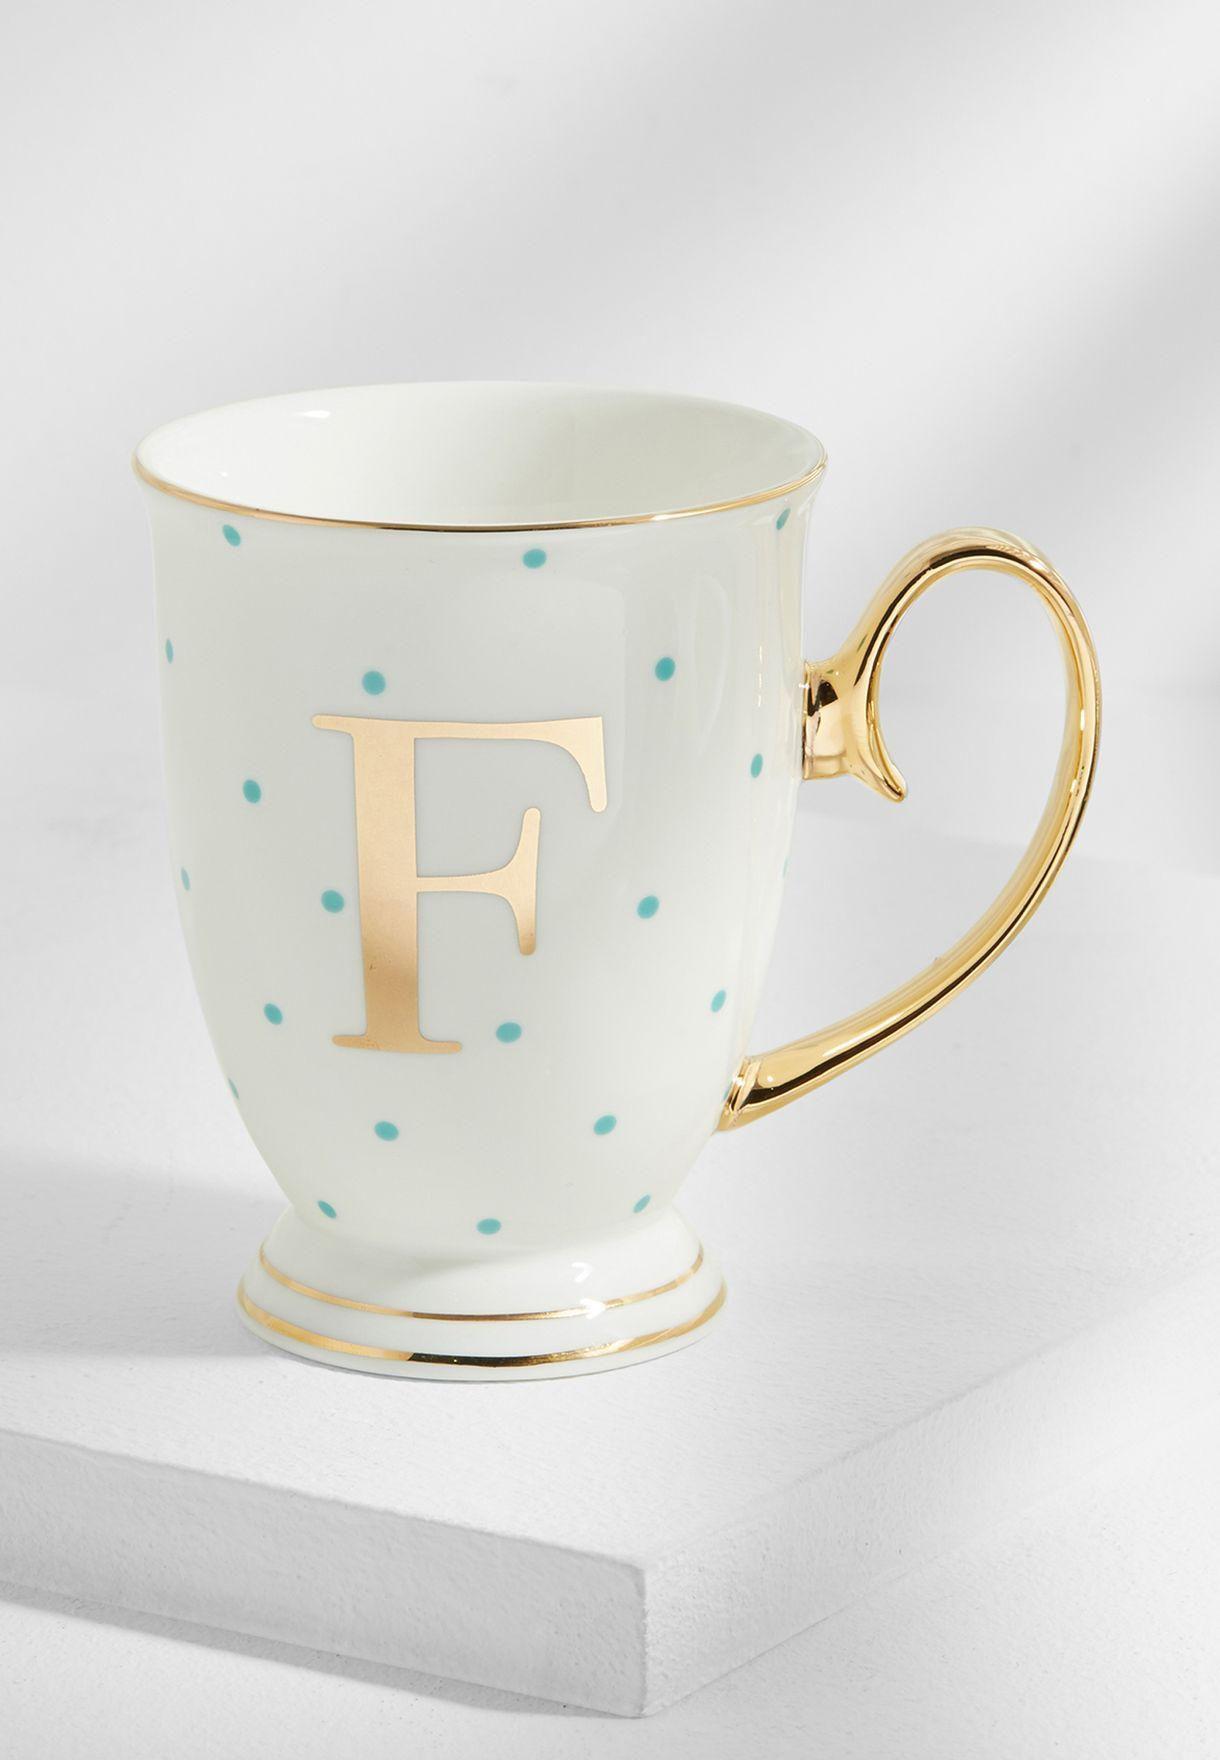 بالصور صور حرف f , اجمل الخليفات لكل من يبدا اسمه بحرف f 2845 3